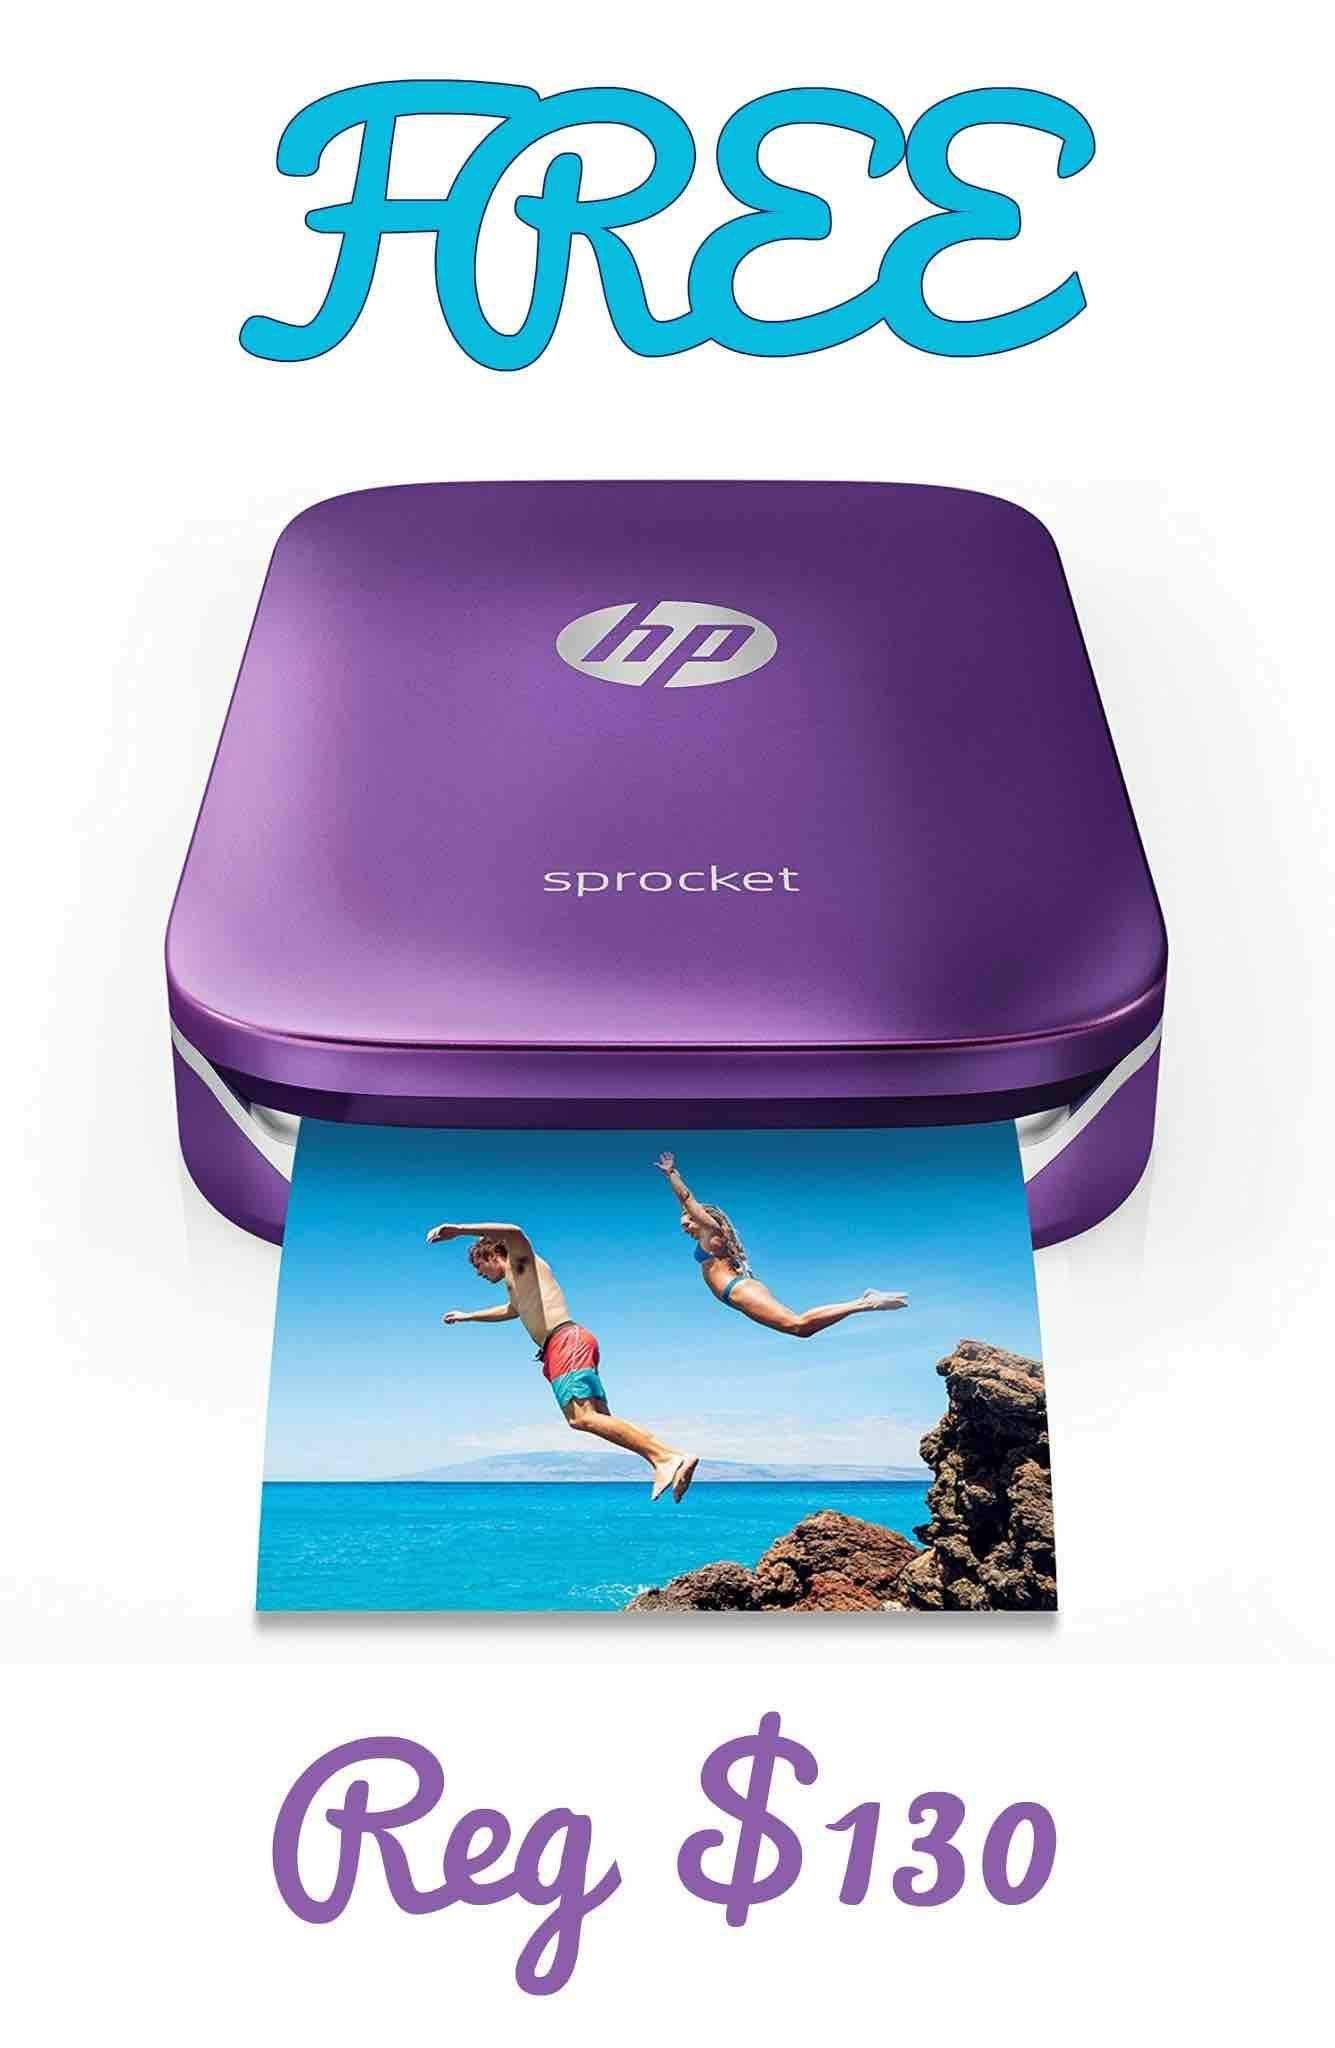 Win A FREE HP Sprocket Portable Photo Printer! Portable